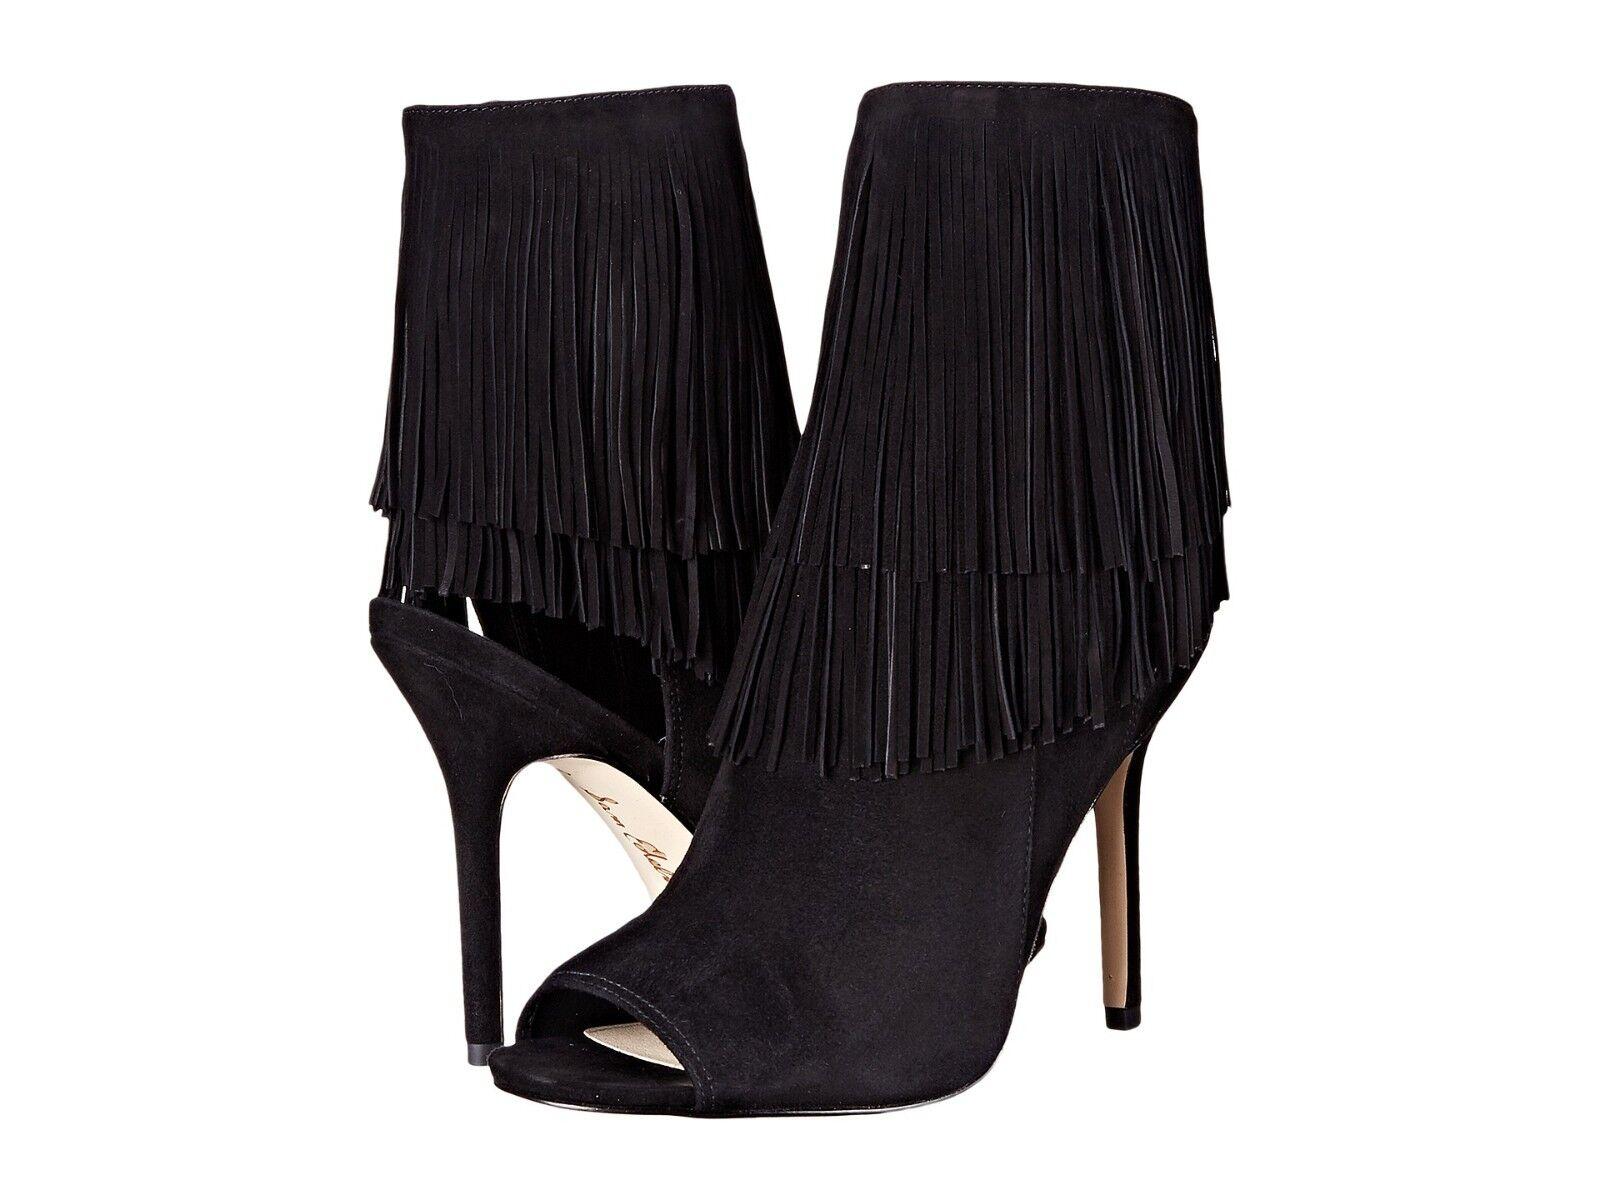 Para mujeres Sam Edelman Edelman Edelman Arizona Peep Toe Botines, E2367L1001 Negro Gamuza Tallas 6-9.5  disfruta ahorrando 30-50% de descuento